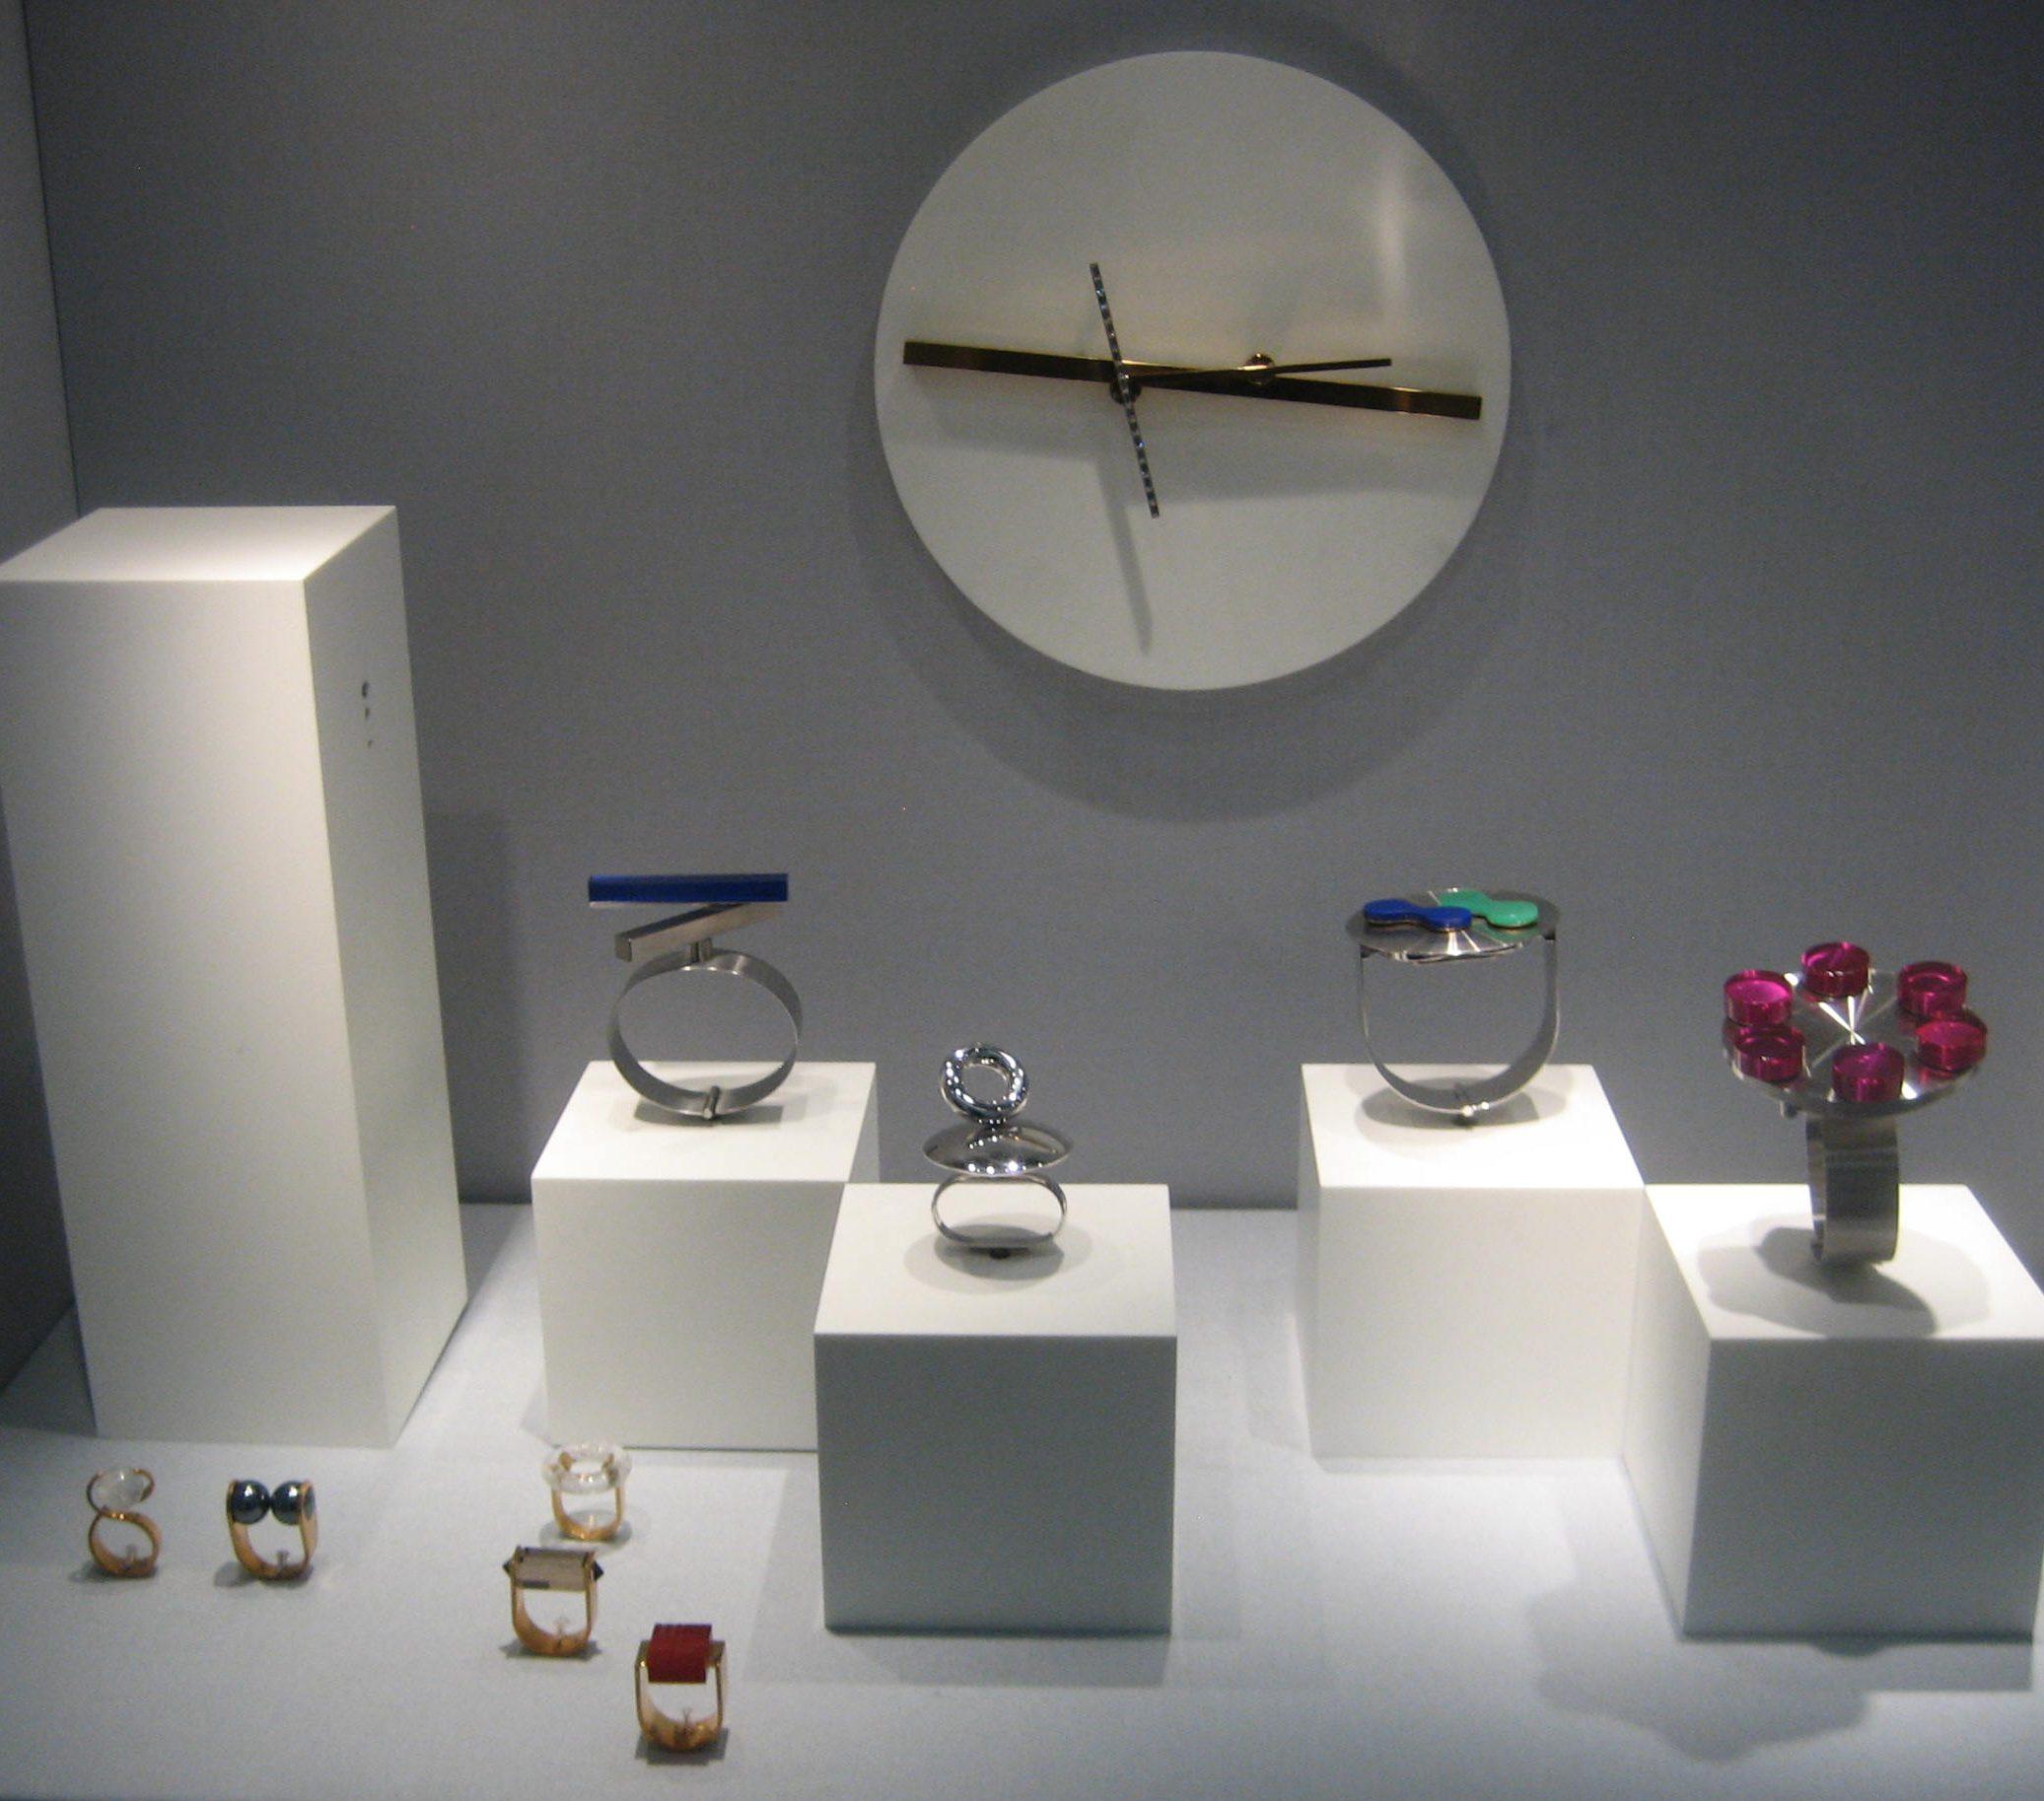 Friedrich Becker. Collectie Schmuckmuseum Pforzheim. Foto Coert Peter Krabbe, mei 2019, ringen, armbanden